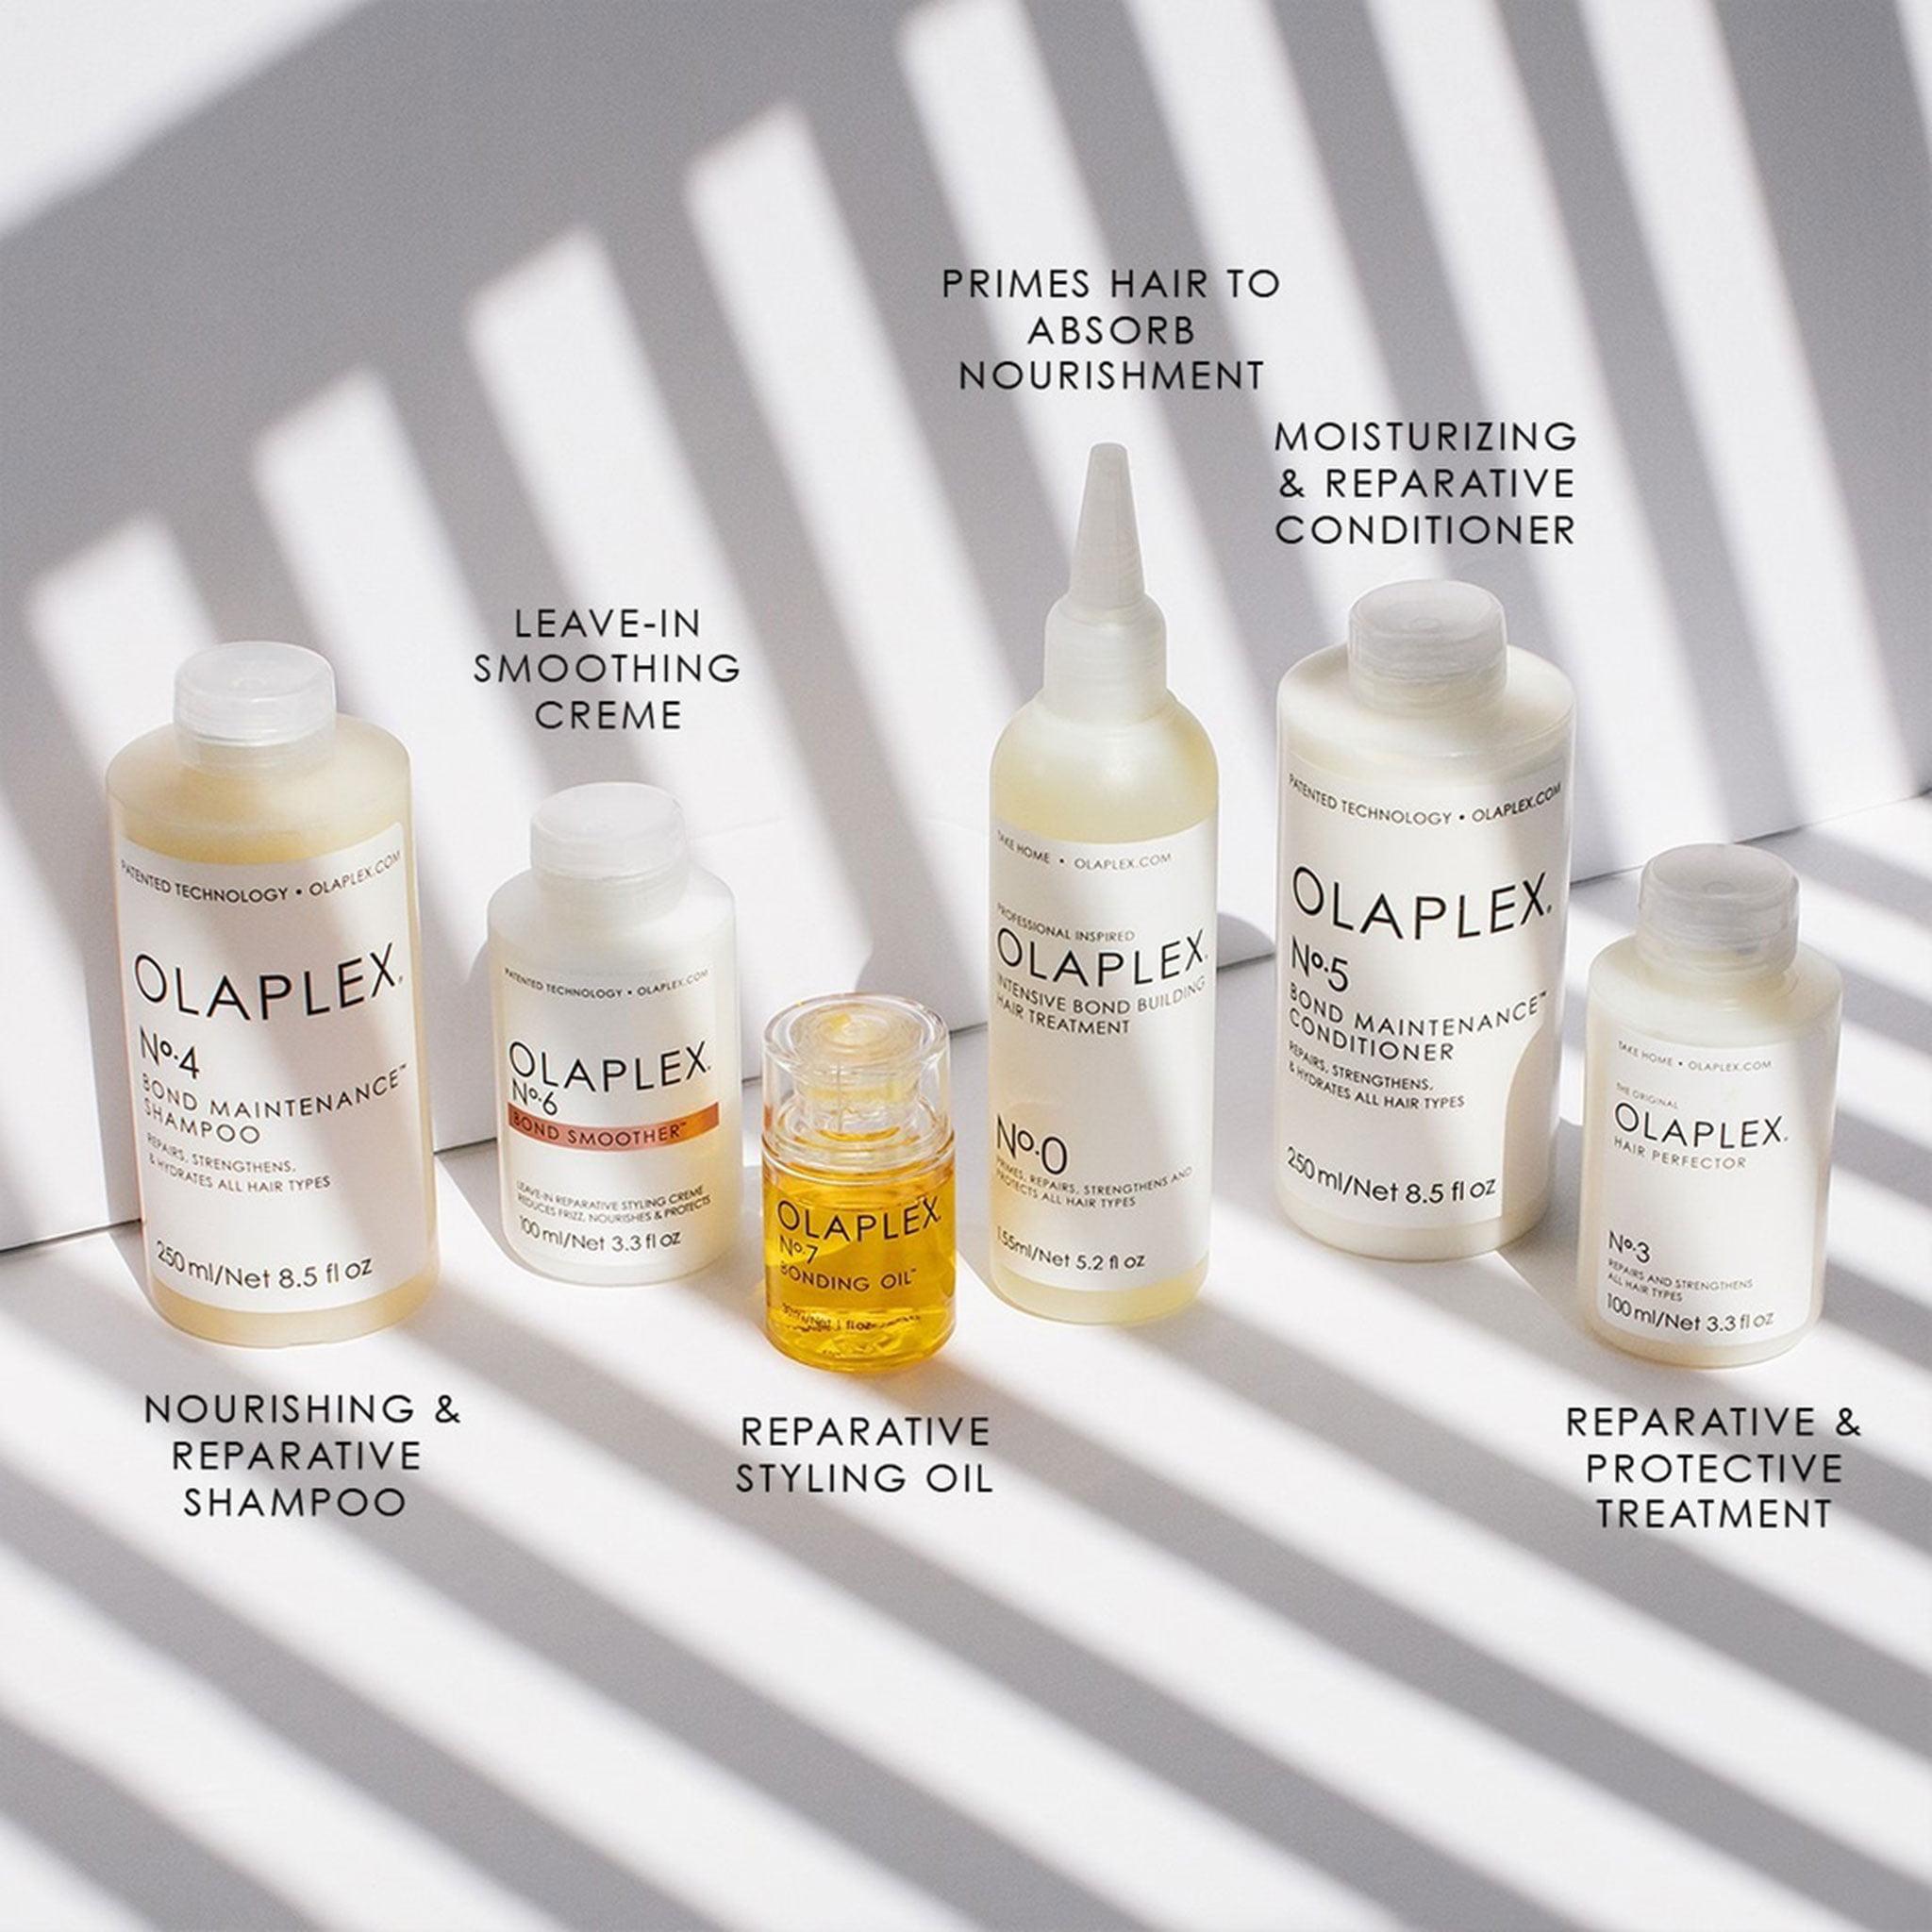 Productos Olaplex en Dénia – The Reference Studio